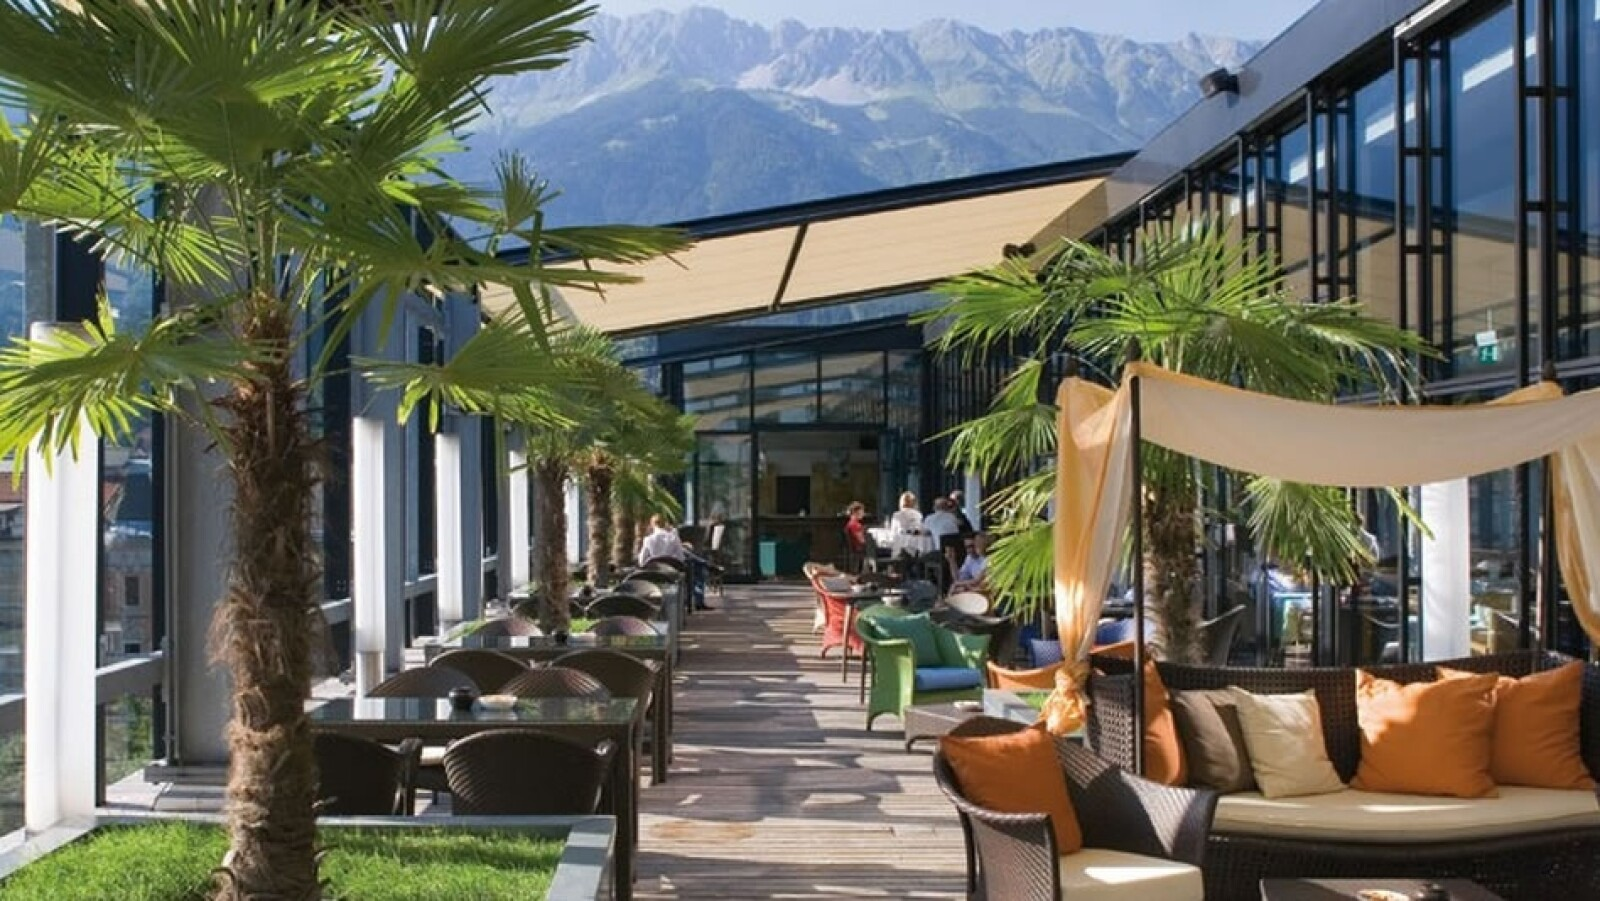 The 5th Floor, The Penz Hotel (Innsbruck, Austria)